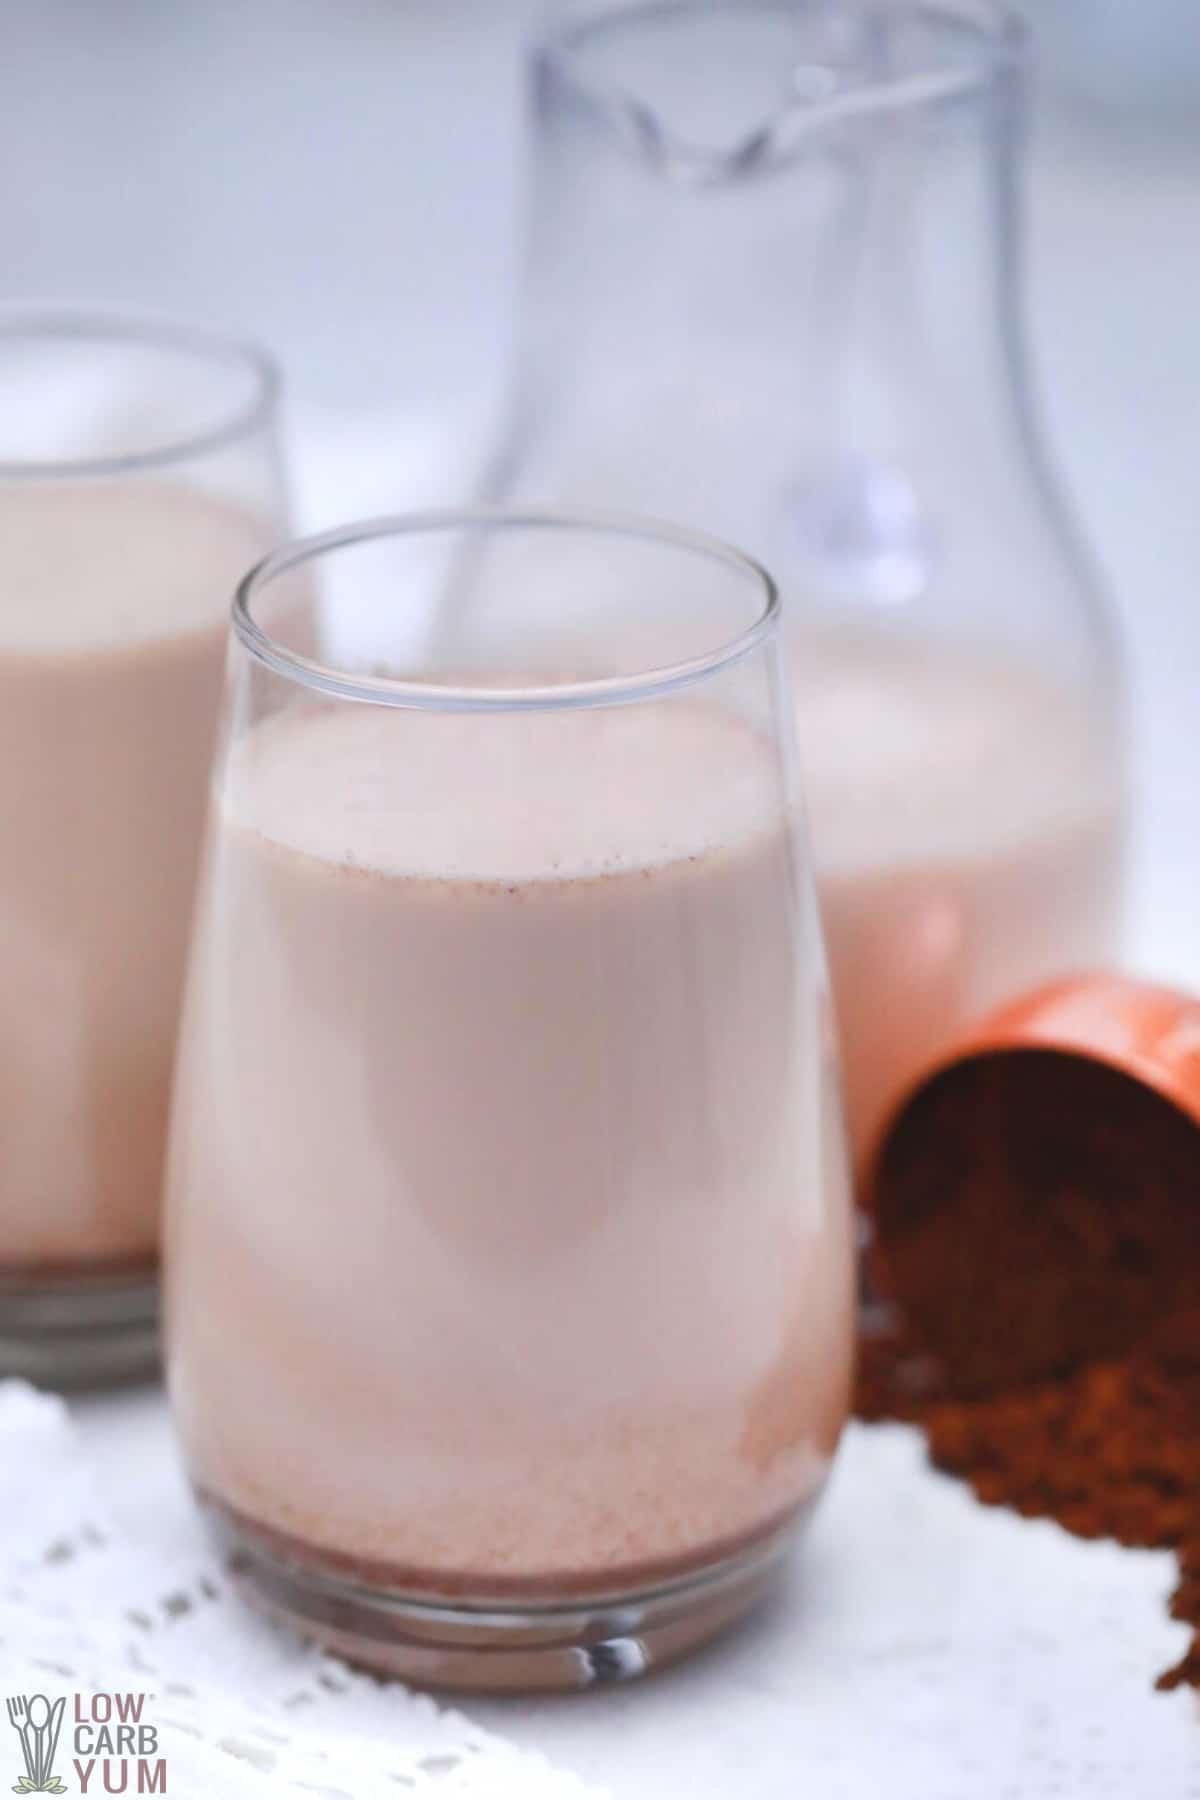 sugar free keto baileys irish cream in glasses and pitcher